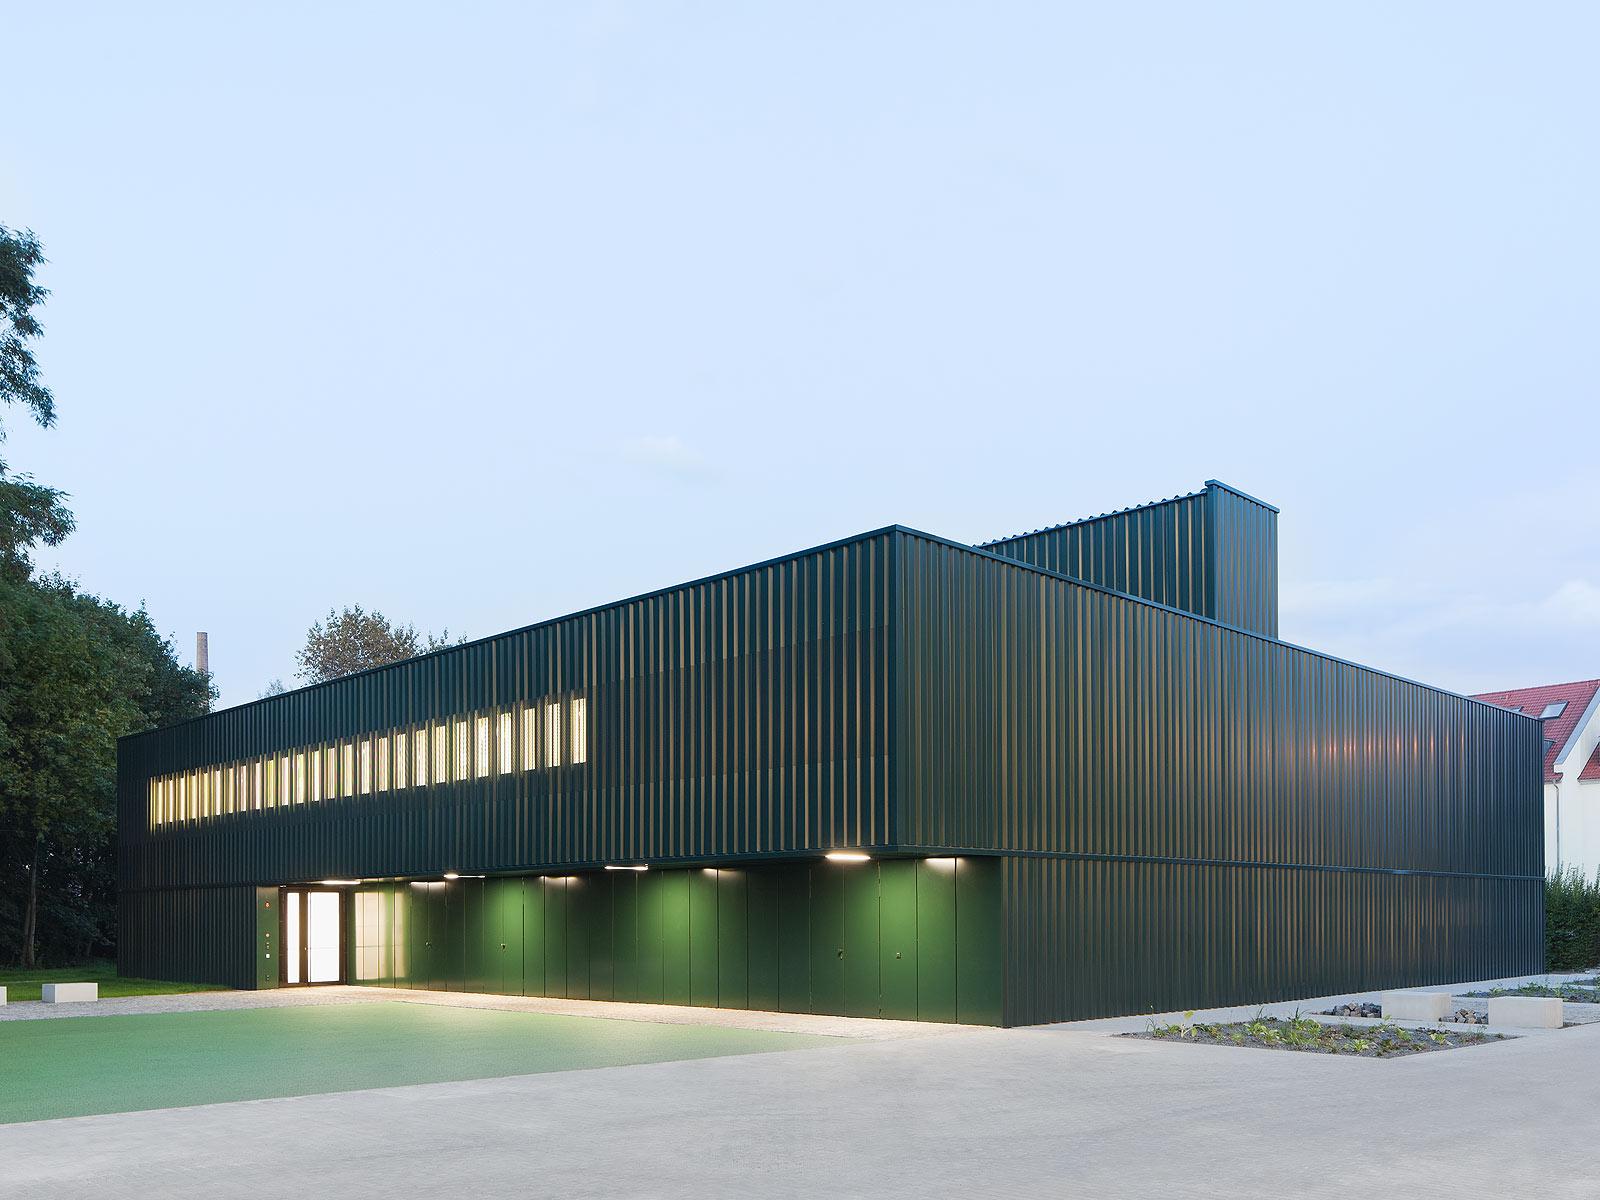 best architects architektur award schulz schulz. Black Bedroom Furniture Sets. Home Design Ideas